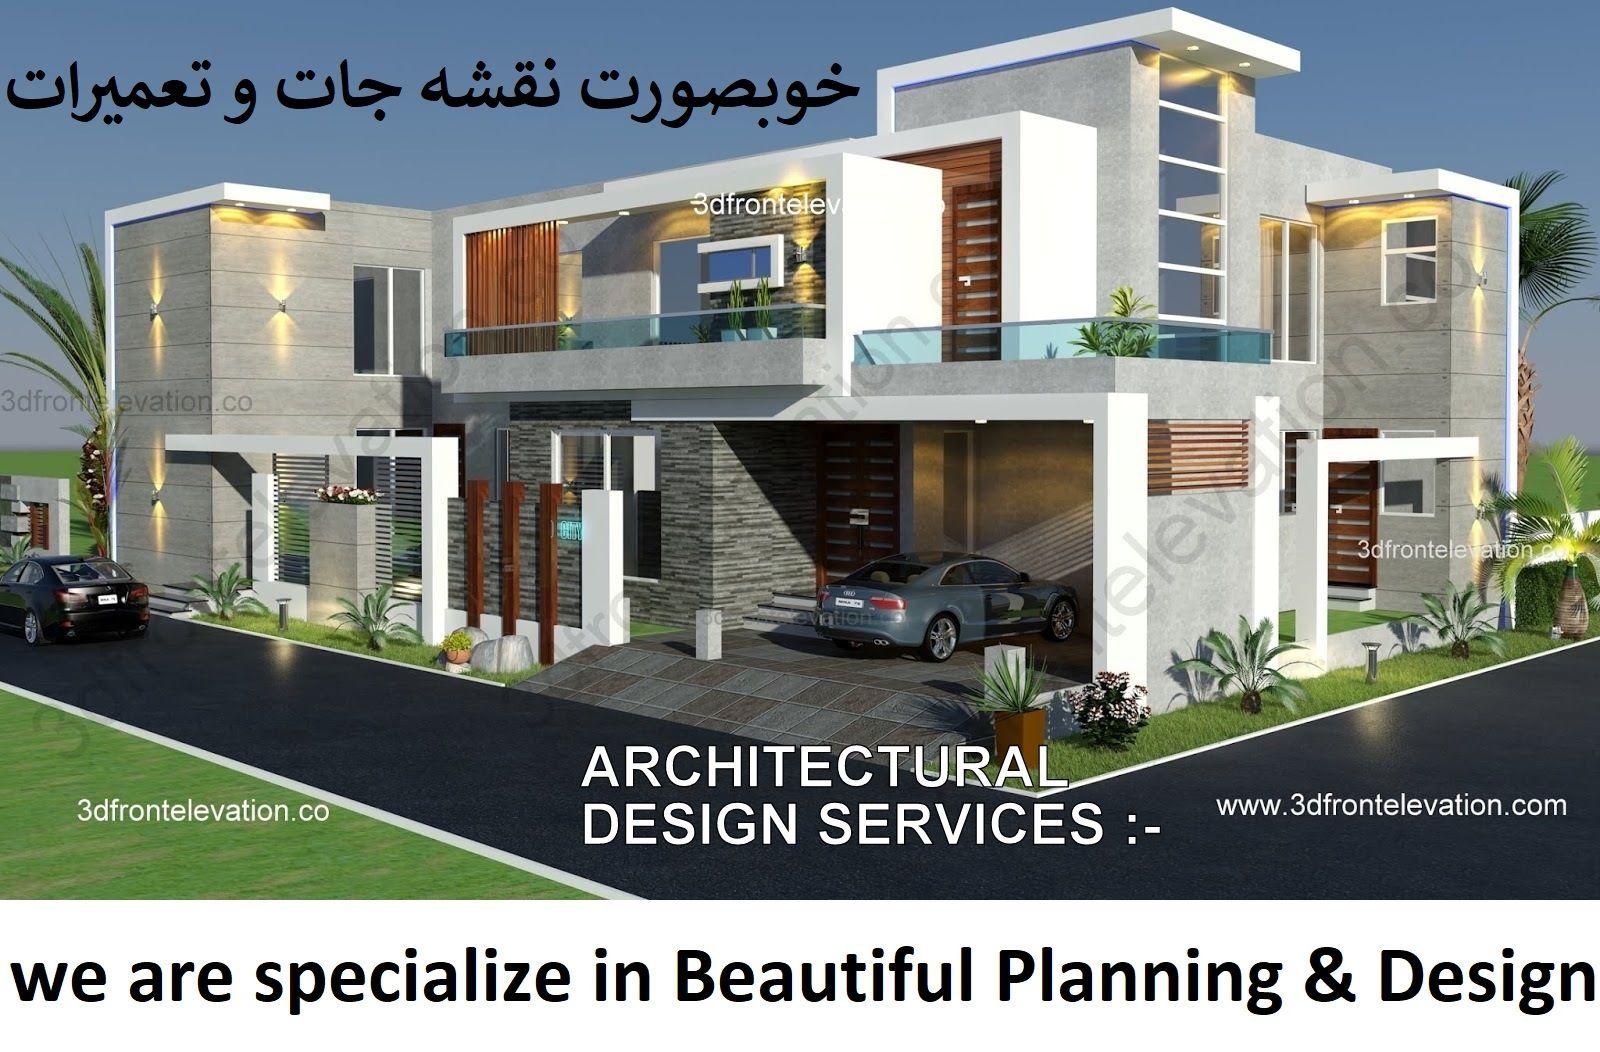 Australian Architectural Modern Corner House 1 Kanal Plan For Sale Latest Pakistani Mini Pool Home Design Plans House New House Plans